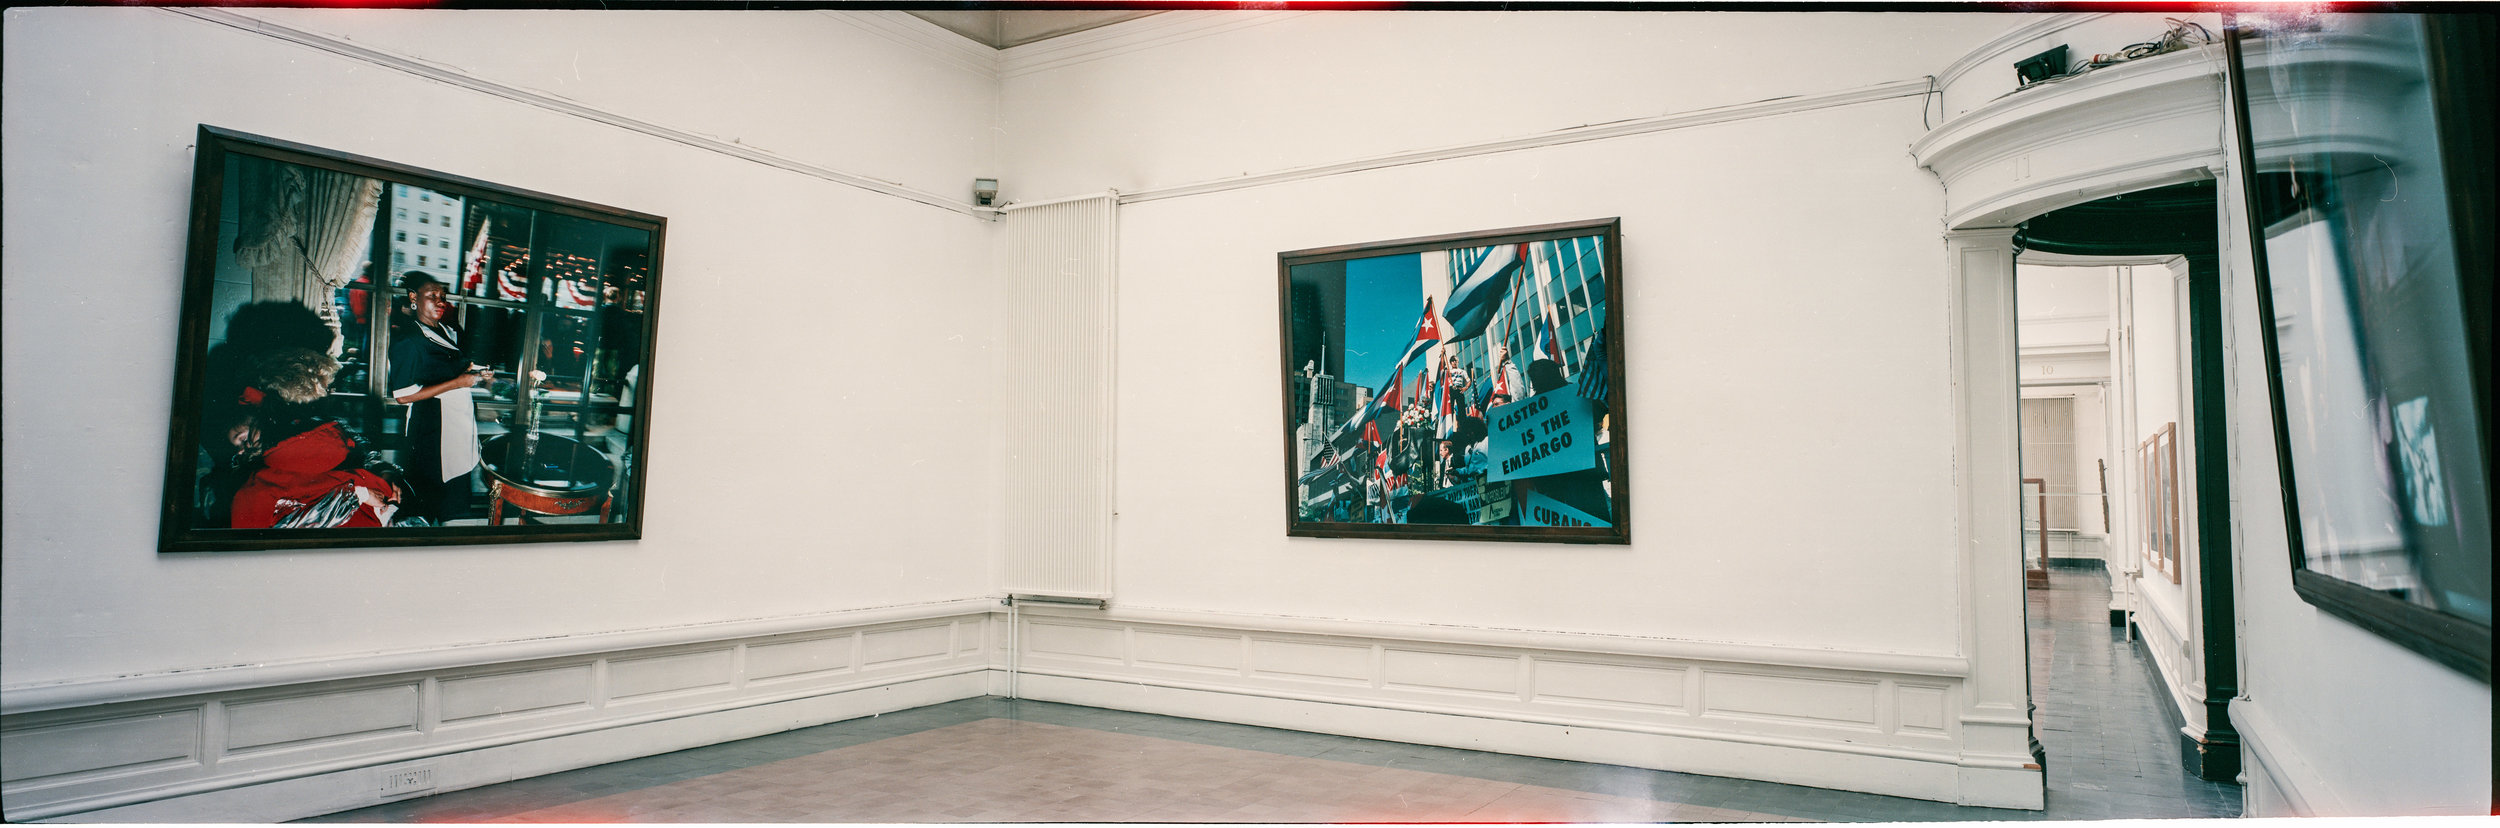 09-07-18-neg-kleur-expo-Tableaux-1996-Panoramisch-14 001.jpg